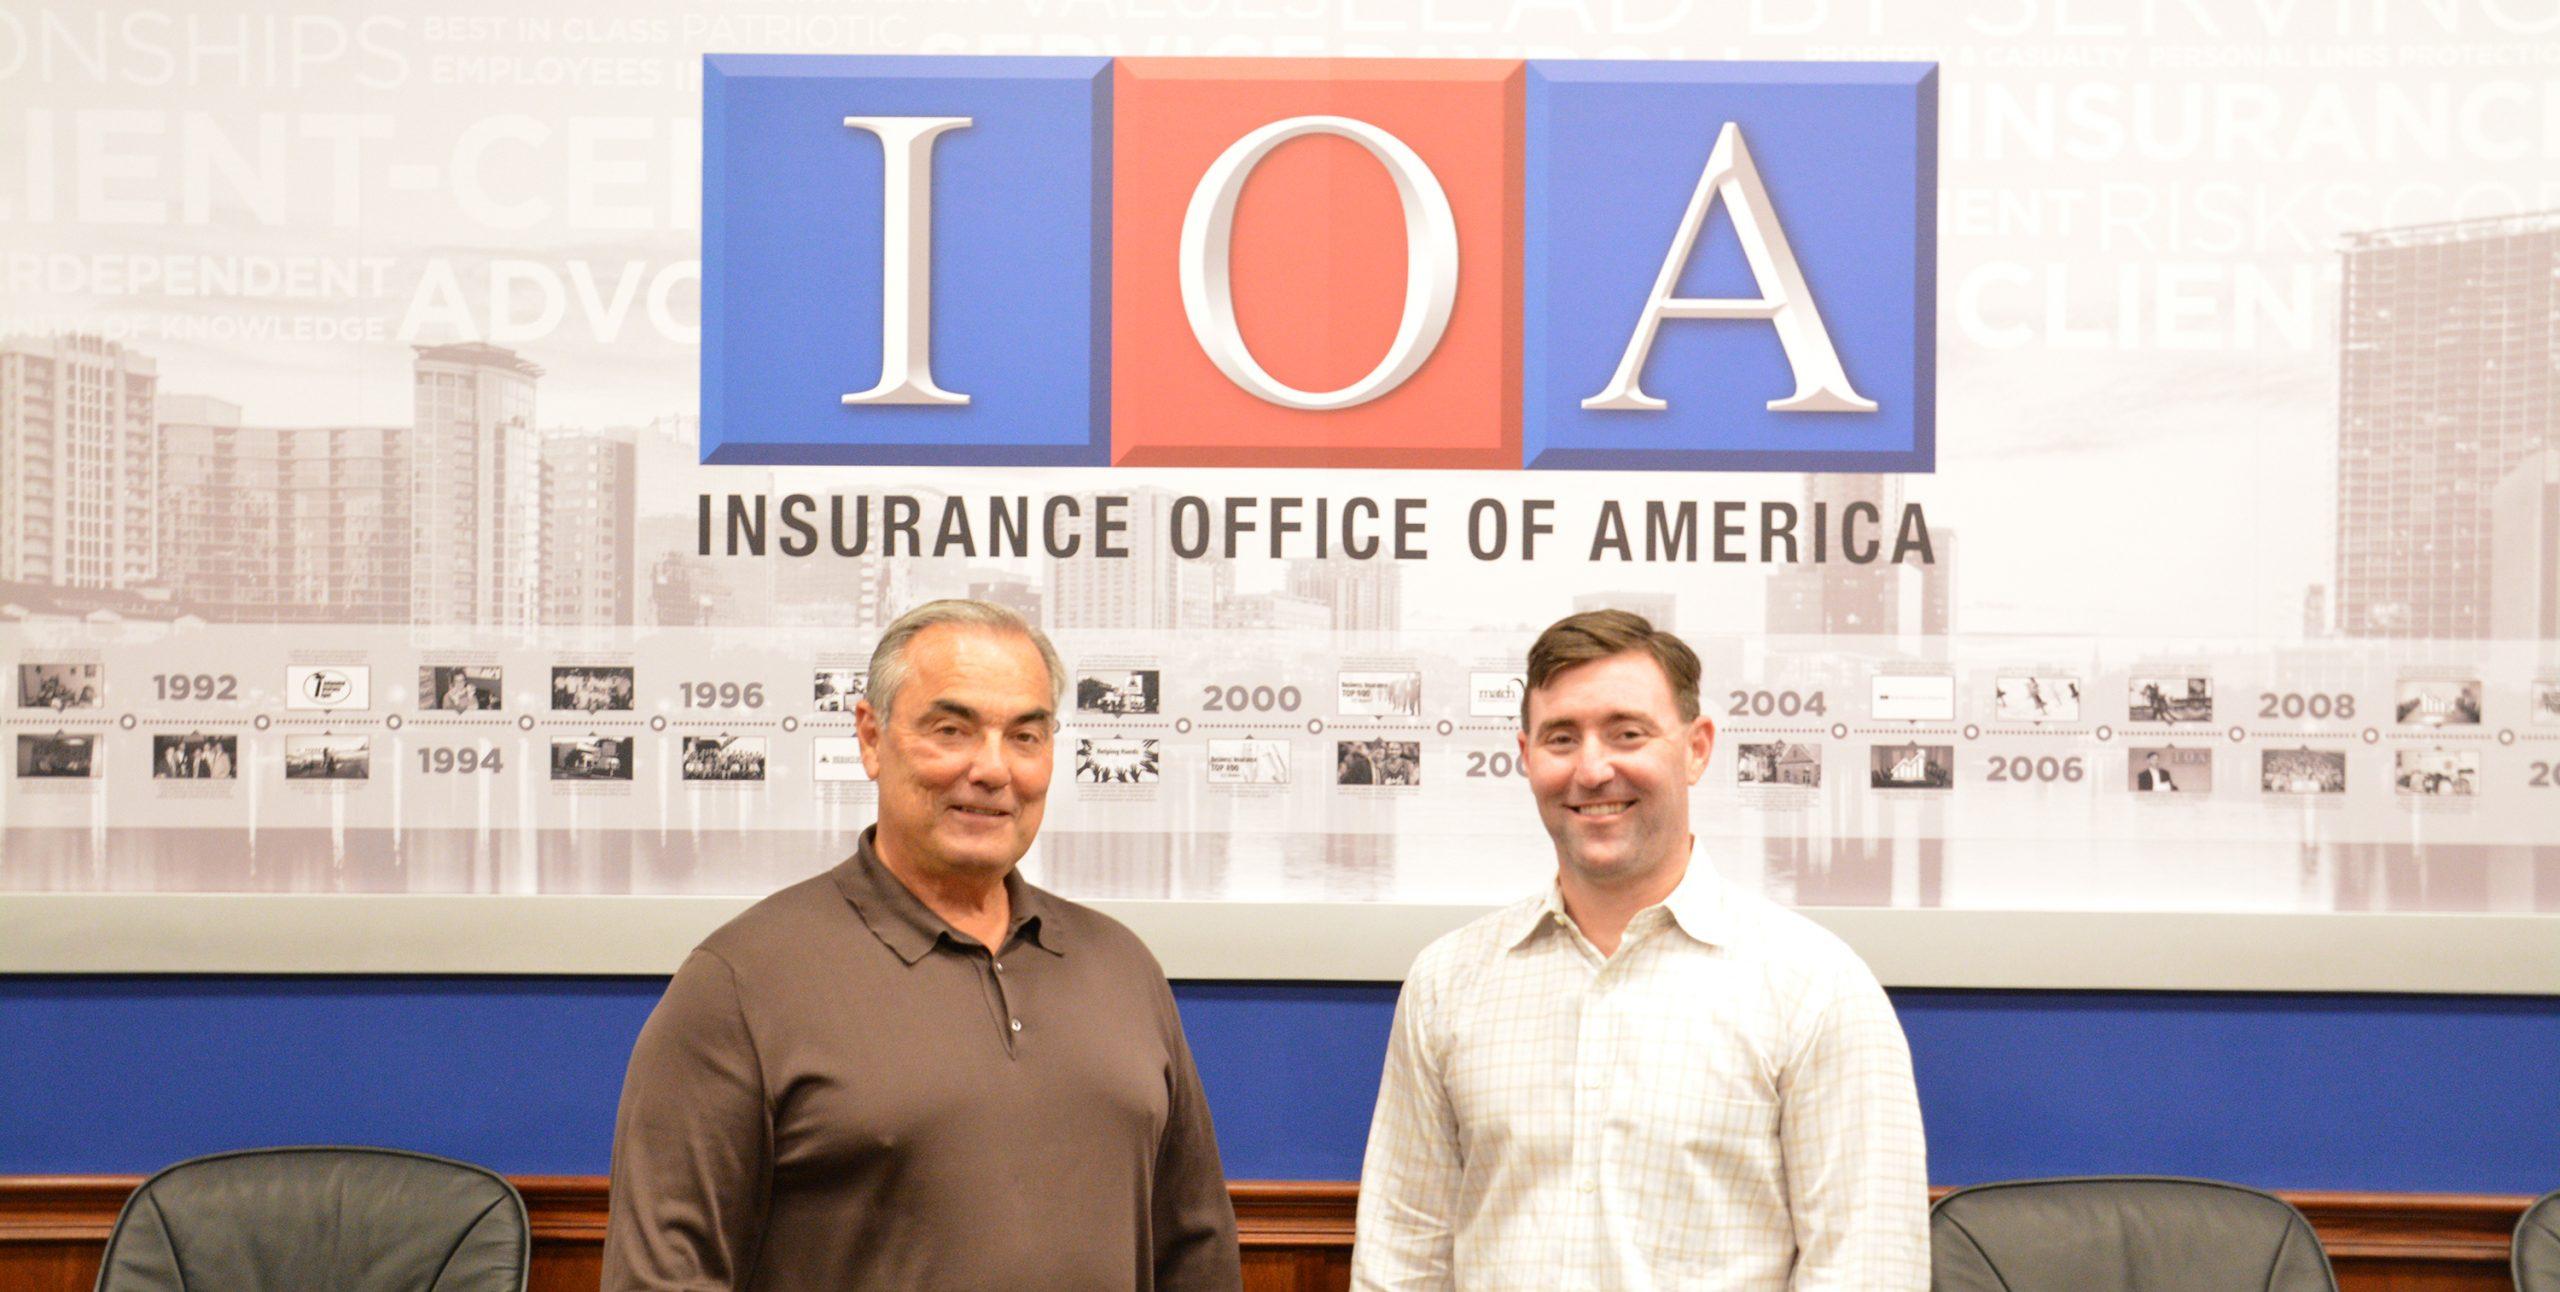 Heath Ritenour, CEO of Insurance Office of America